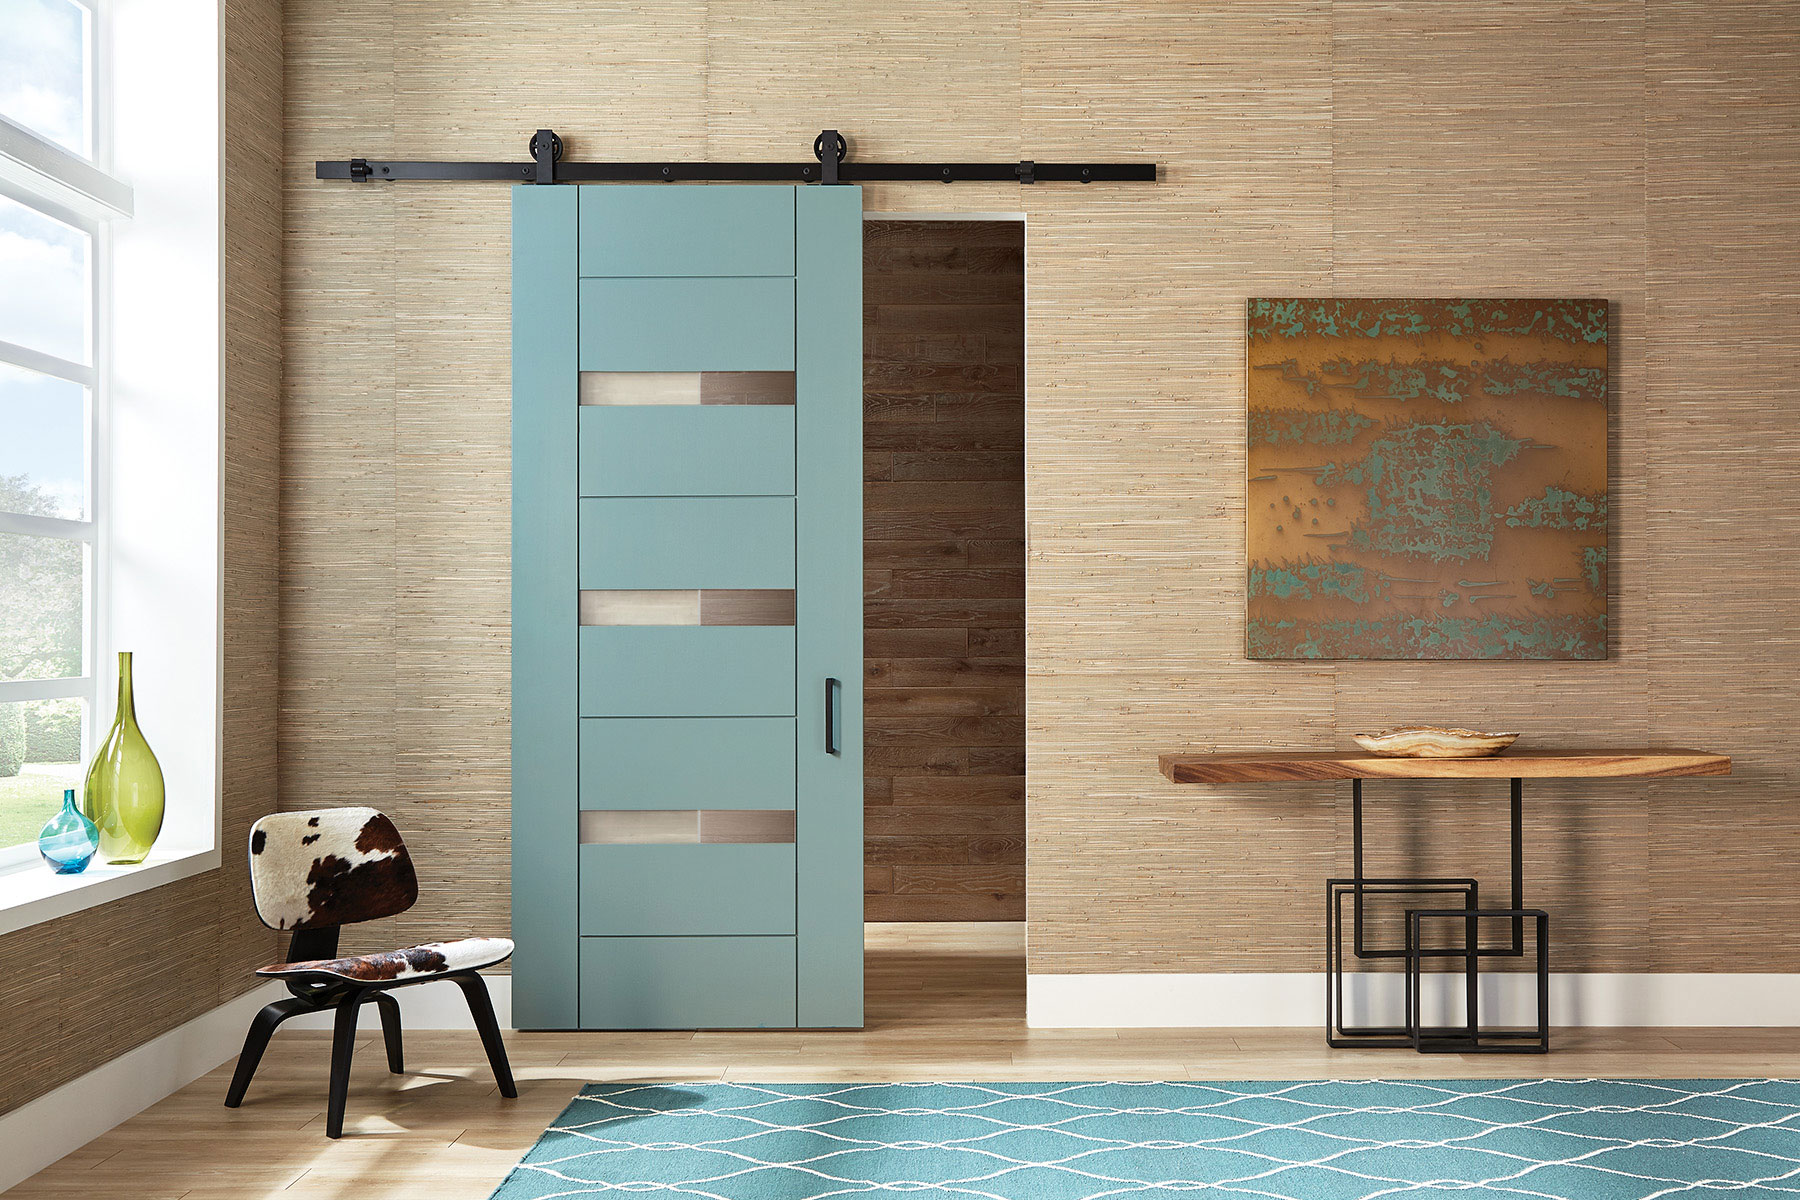 Diy Barn Style Bathroom Door: TruStile Doors